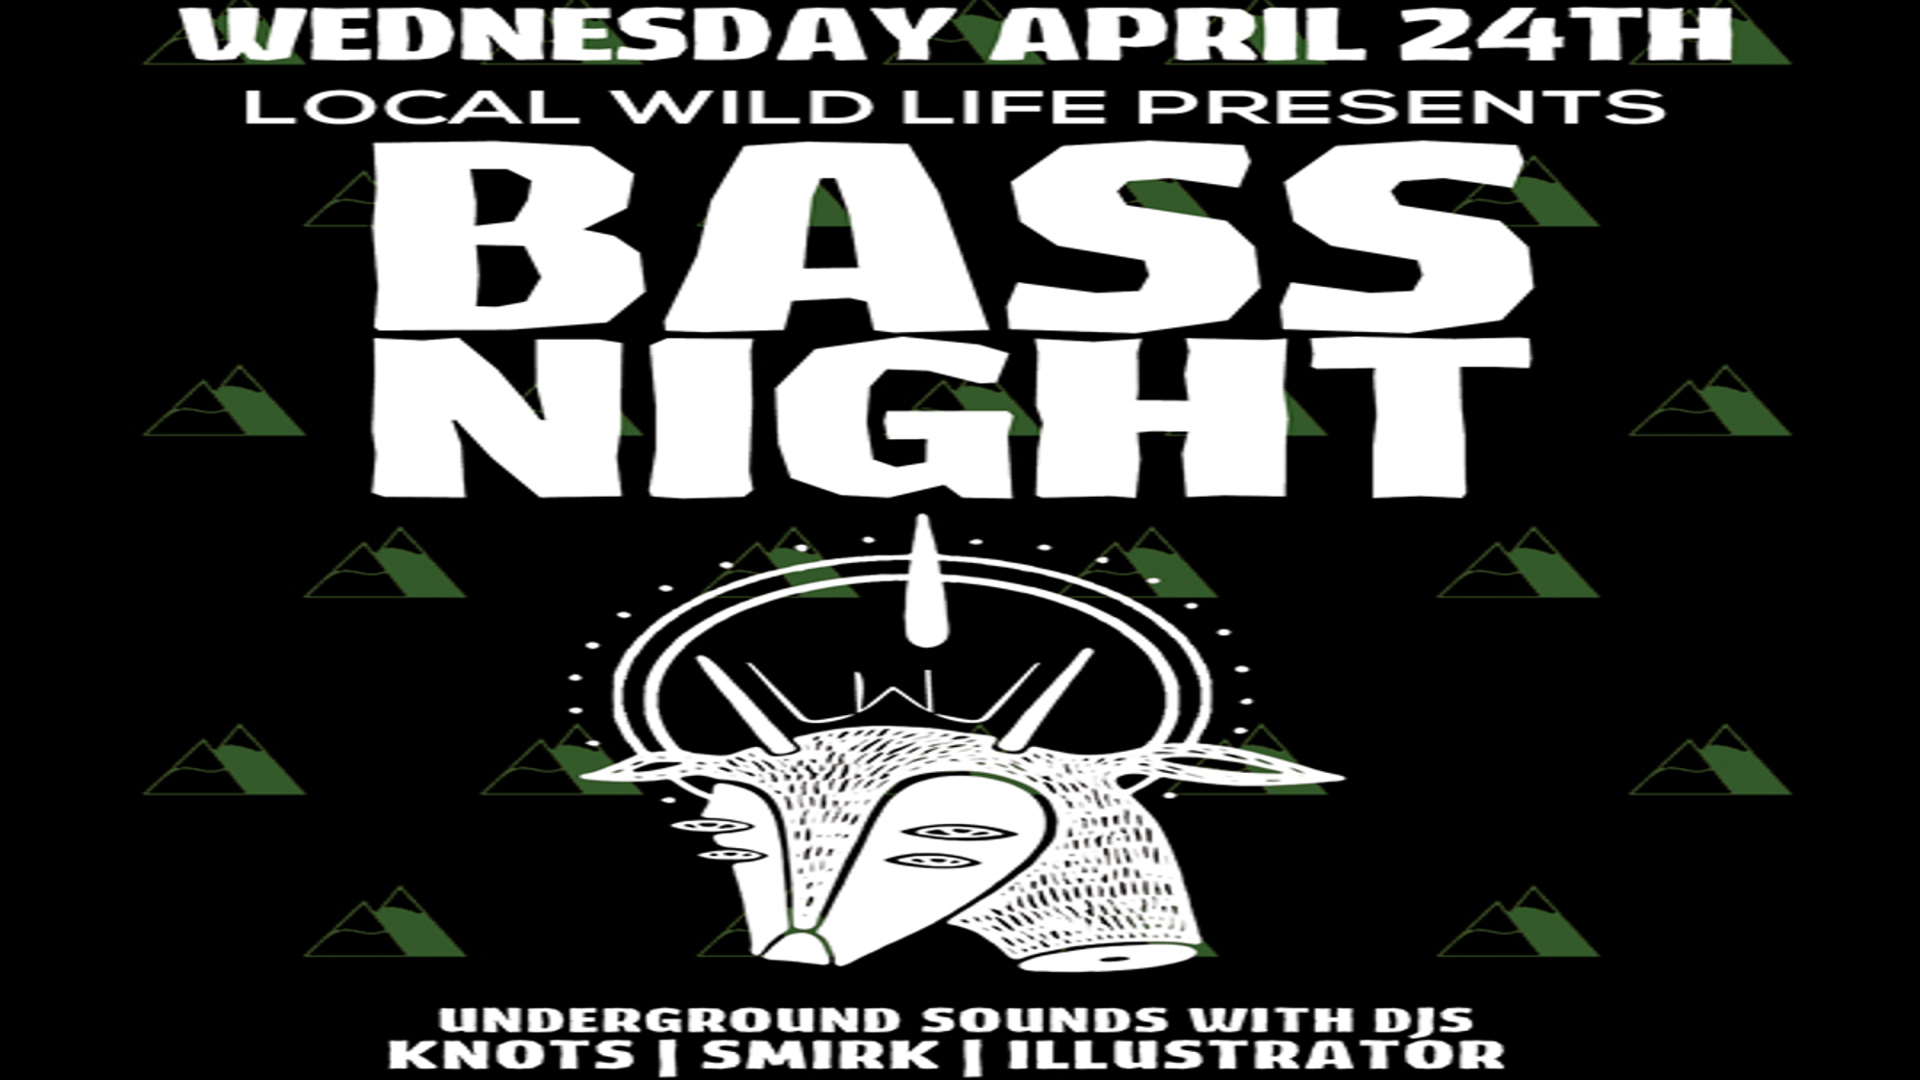 sasquatch bass april 24 2019 event.jpg